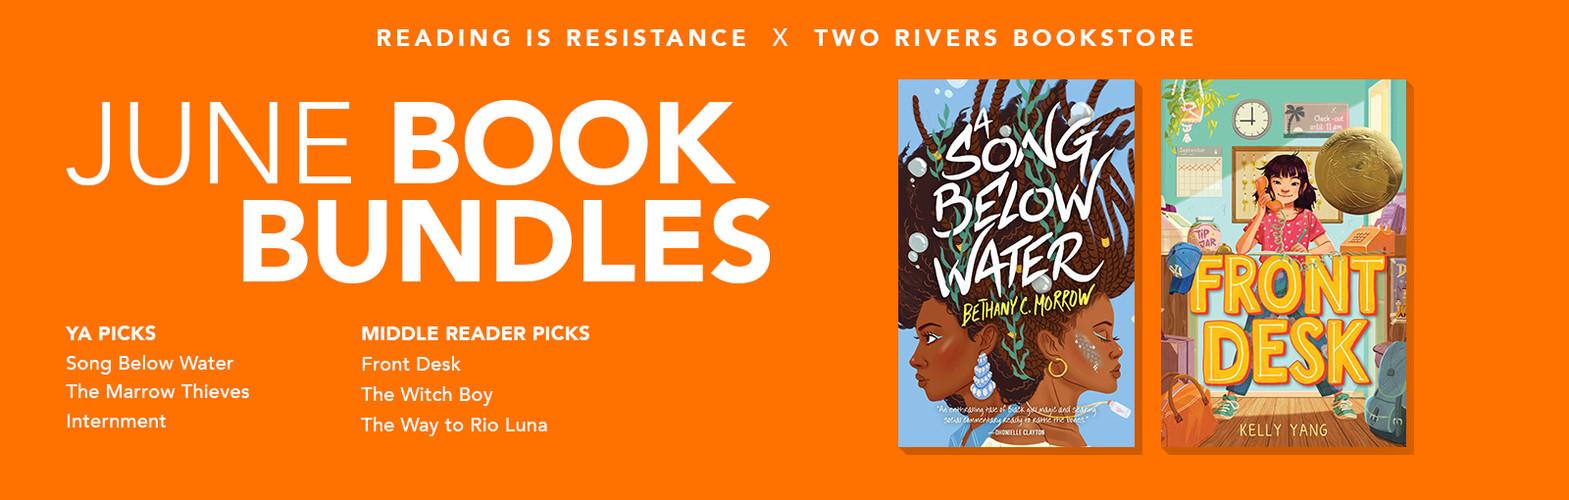 June book bundle banner-2.jpg